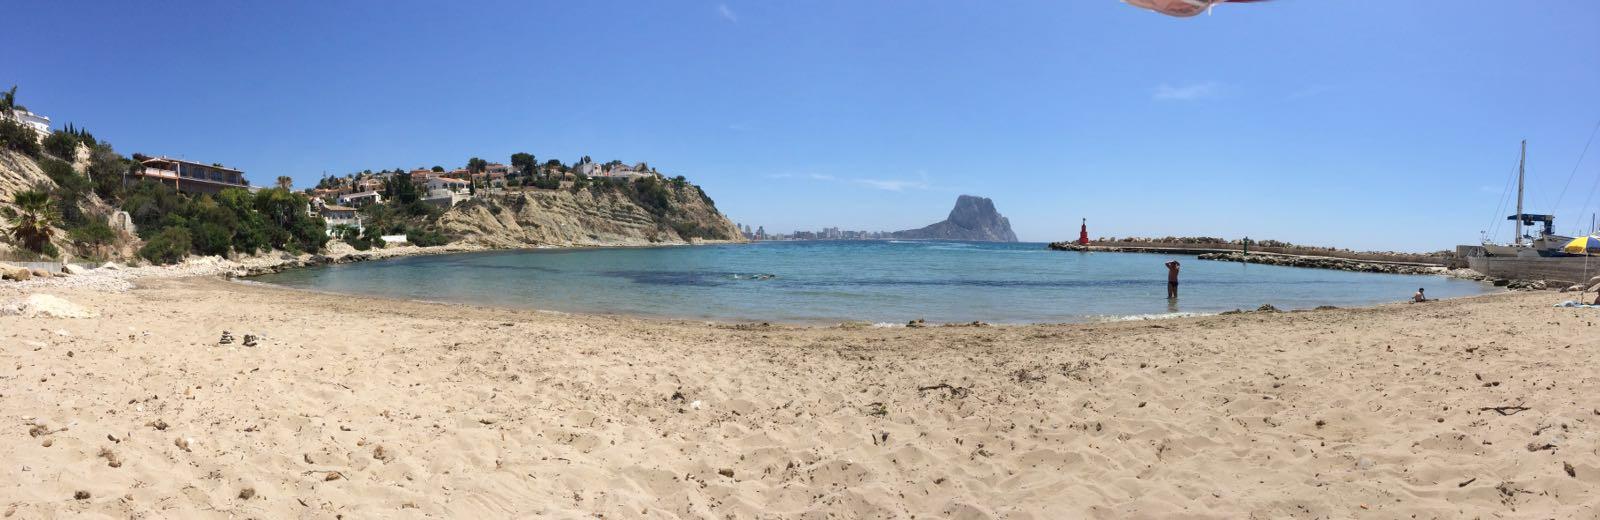 Playa Puerto Blanco